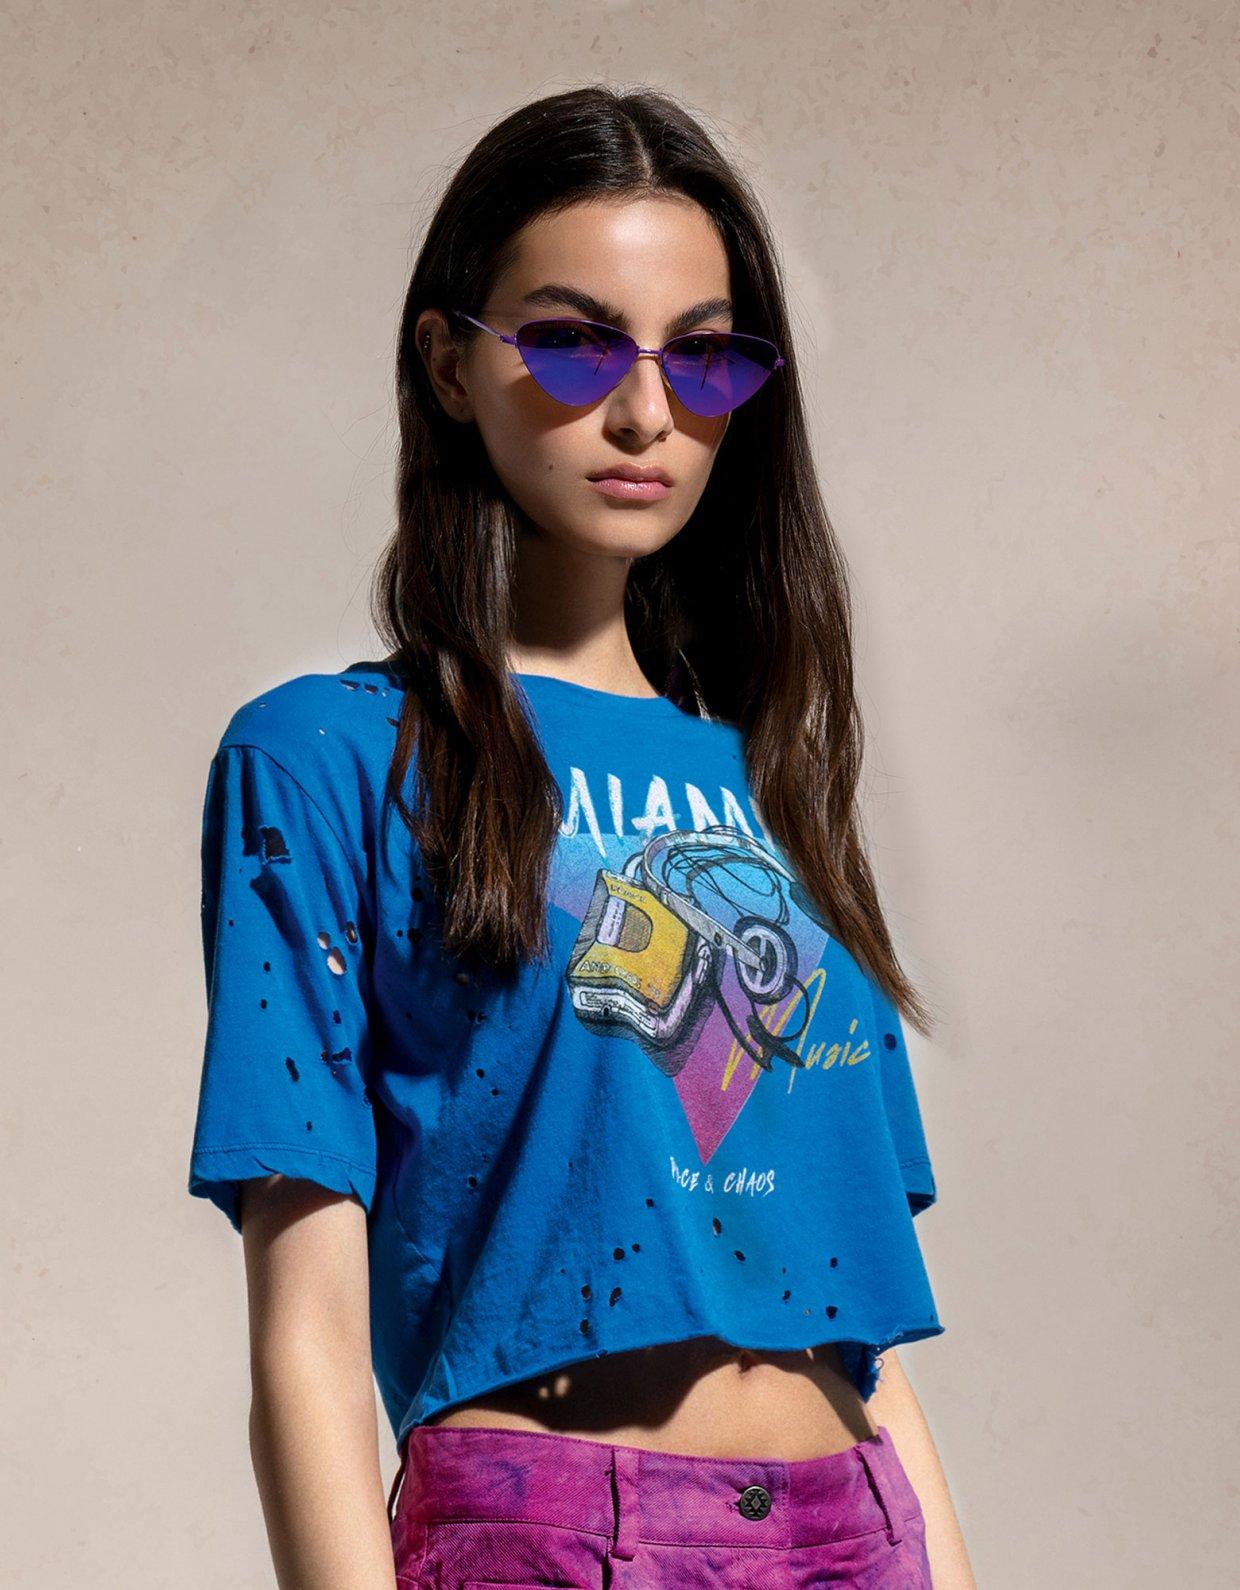 Peace & Chaos Miami music t-shirt